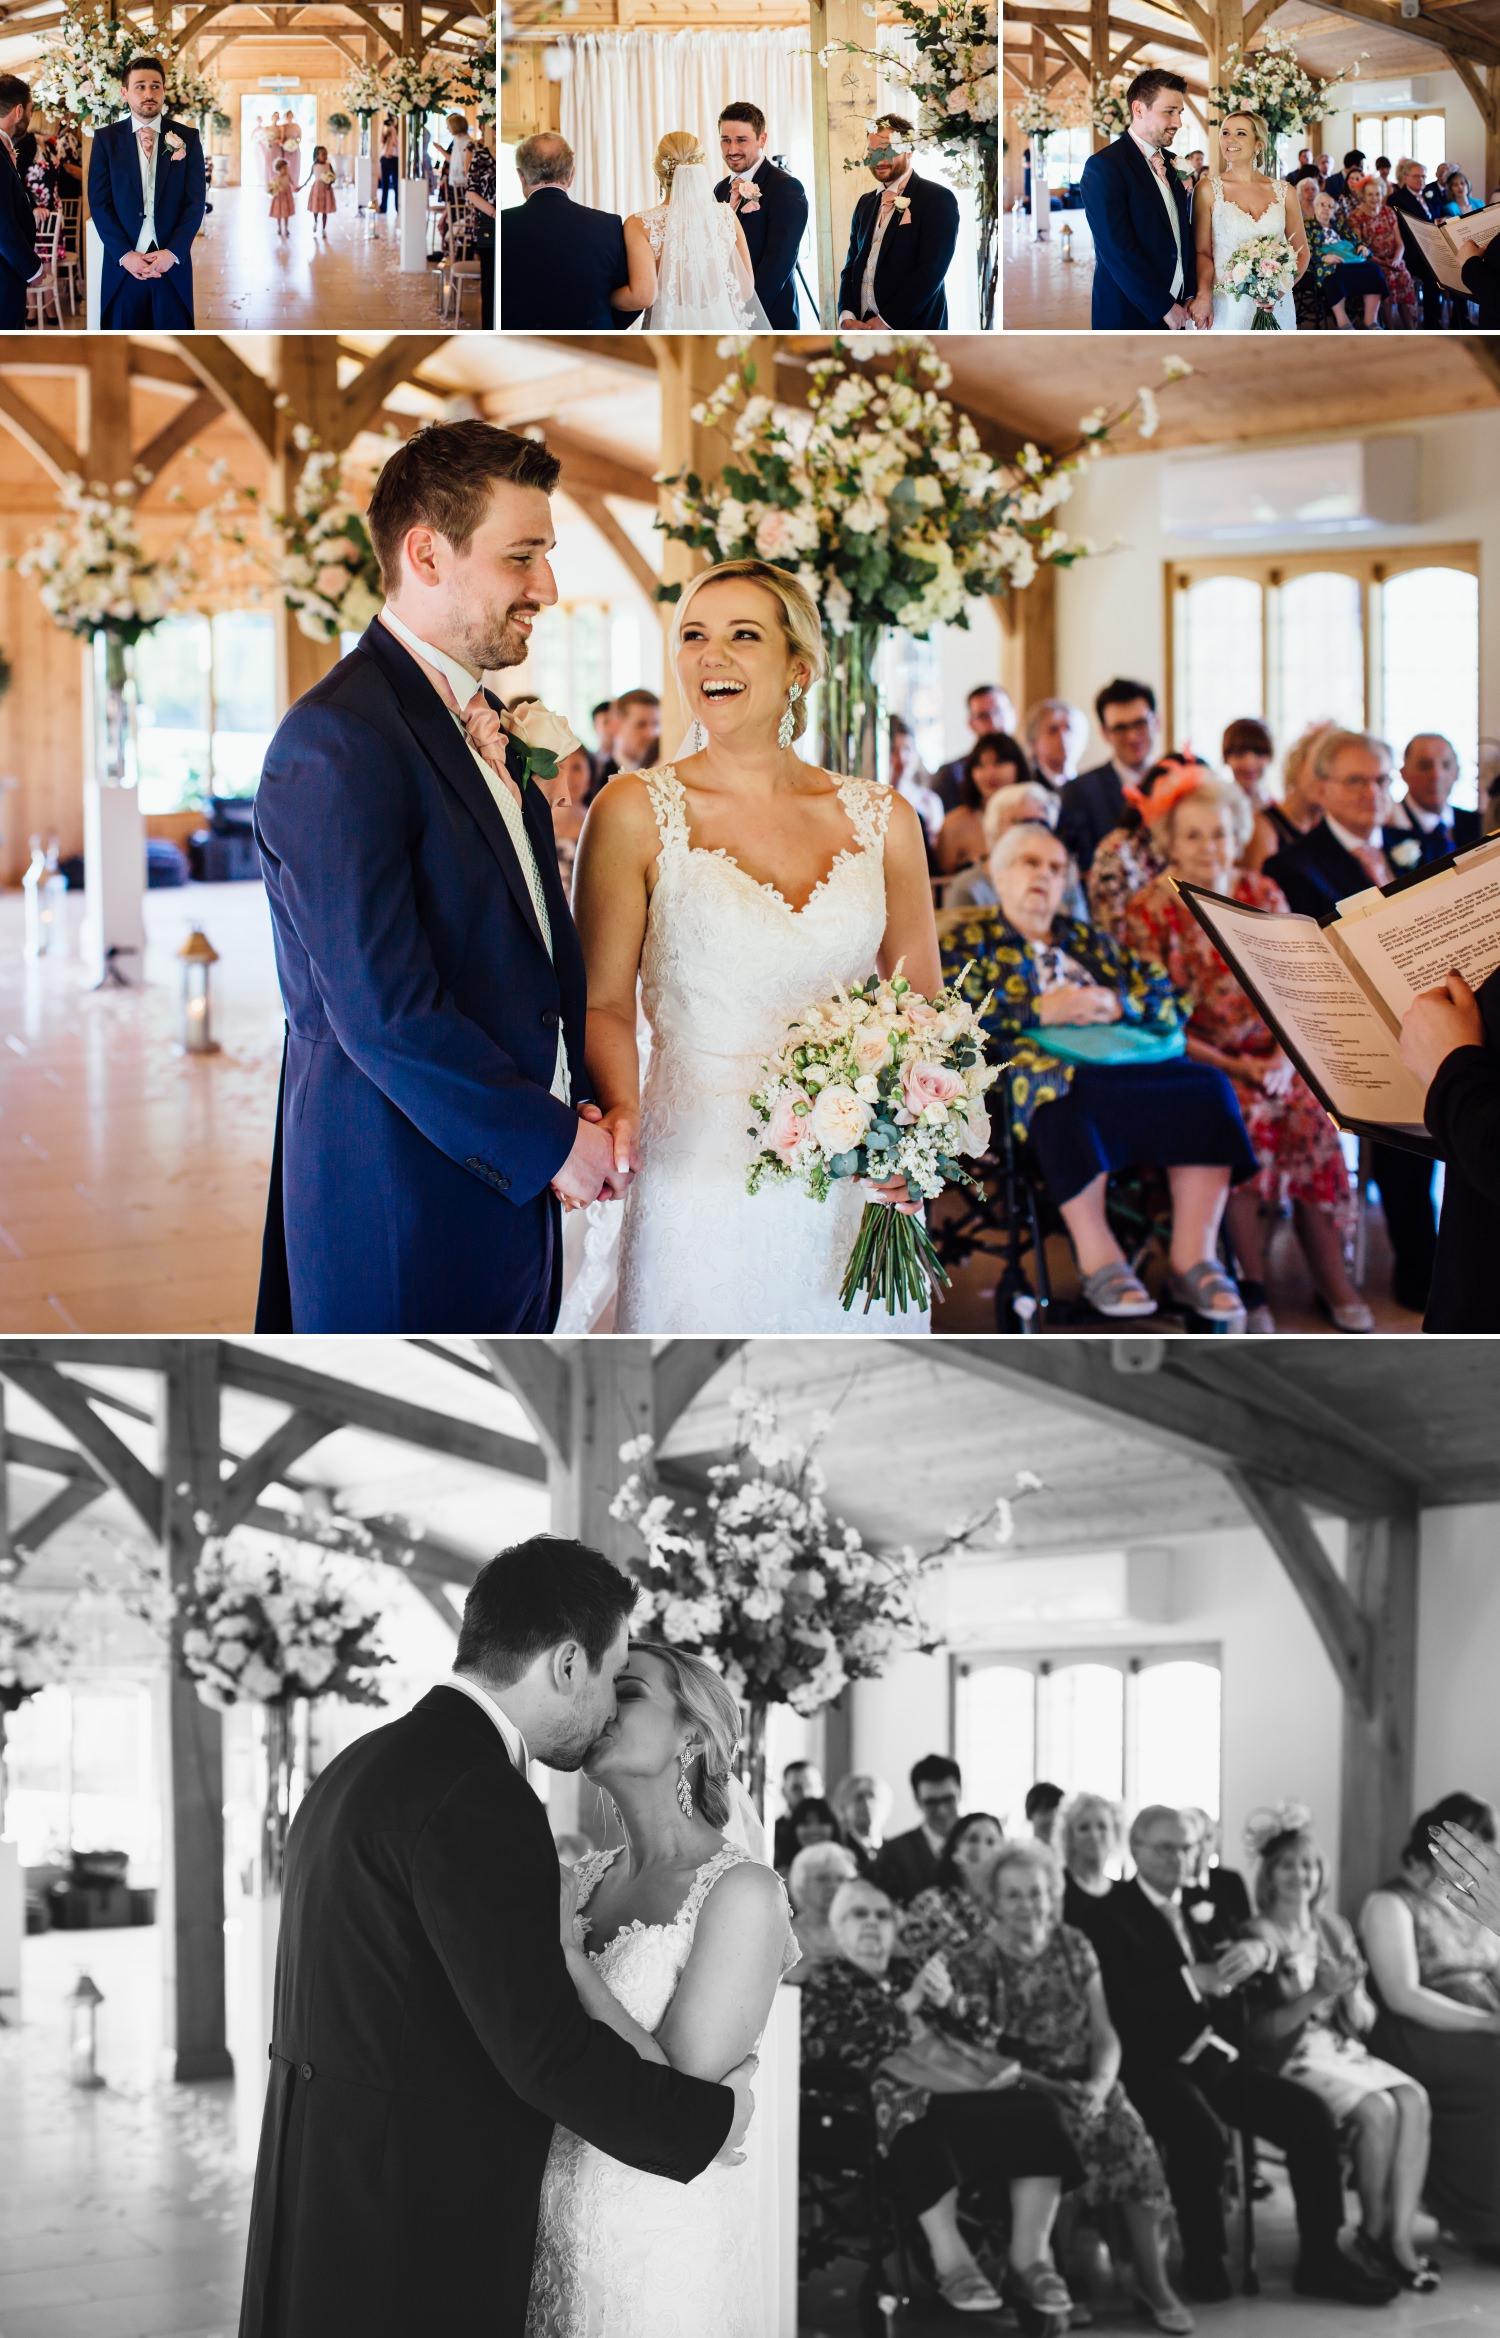 wedding ceremony at Colshaw Hall cheshire